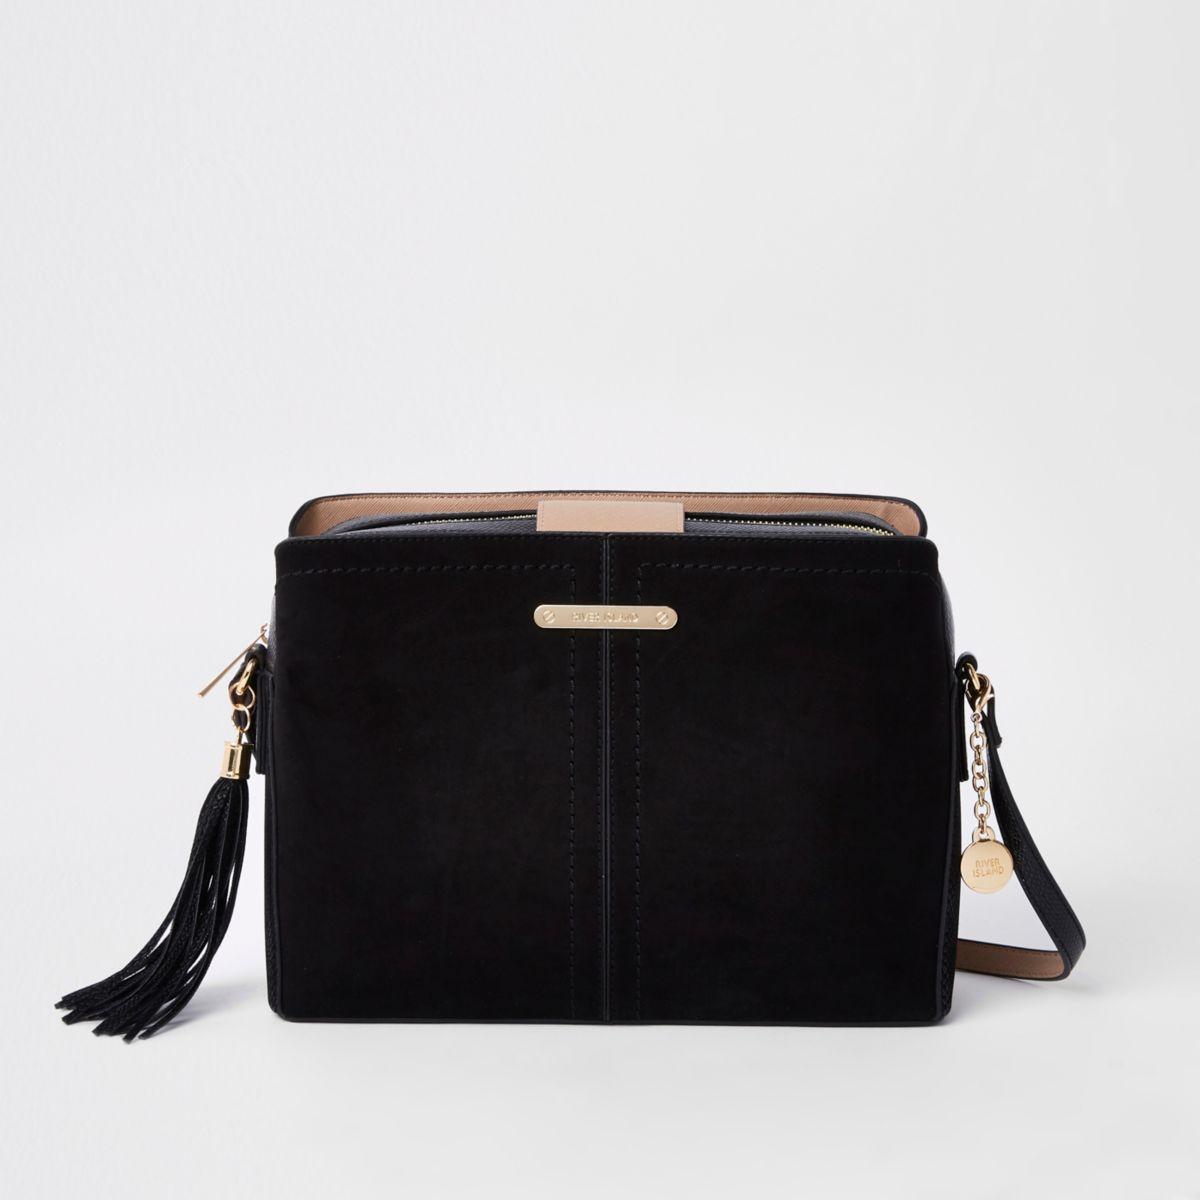 3fc0cbbb9c Black contrast bucket cross body bag - Cross Body Bags - Bags ...